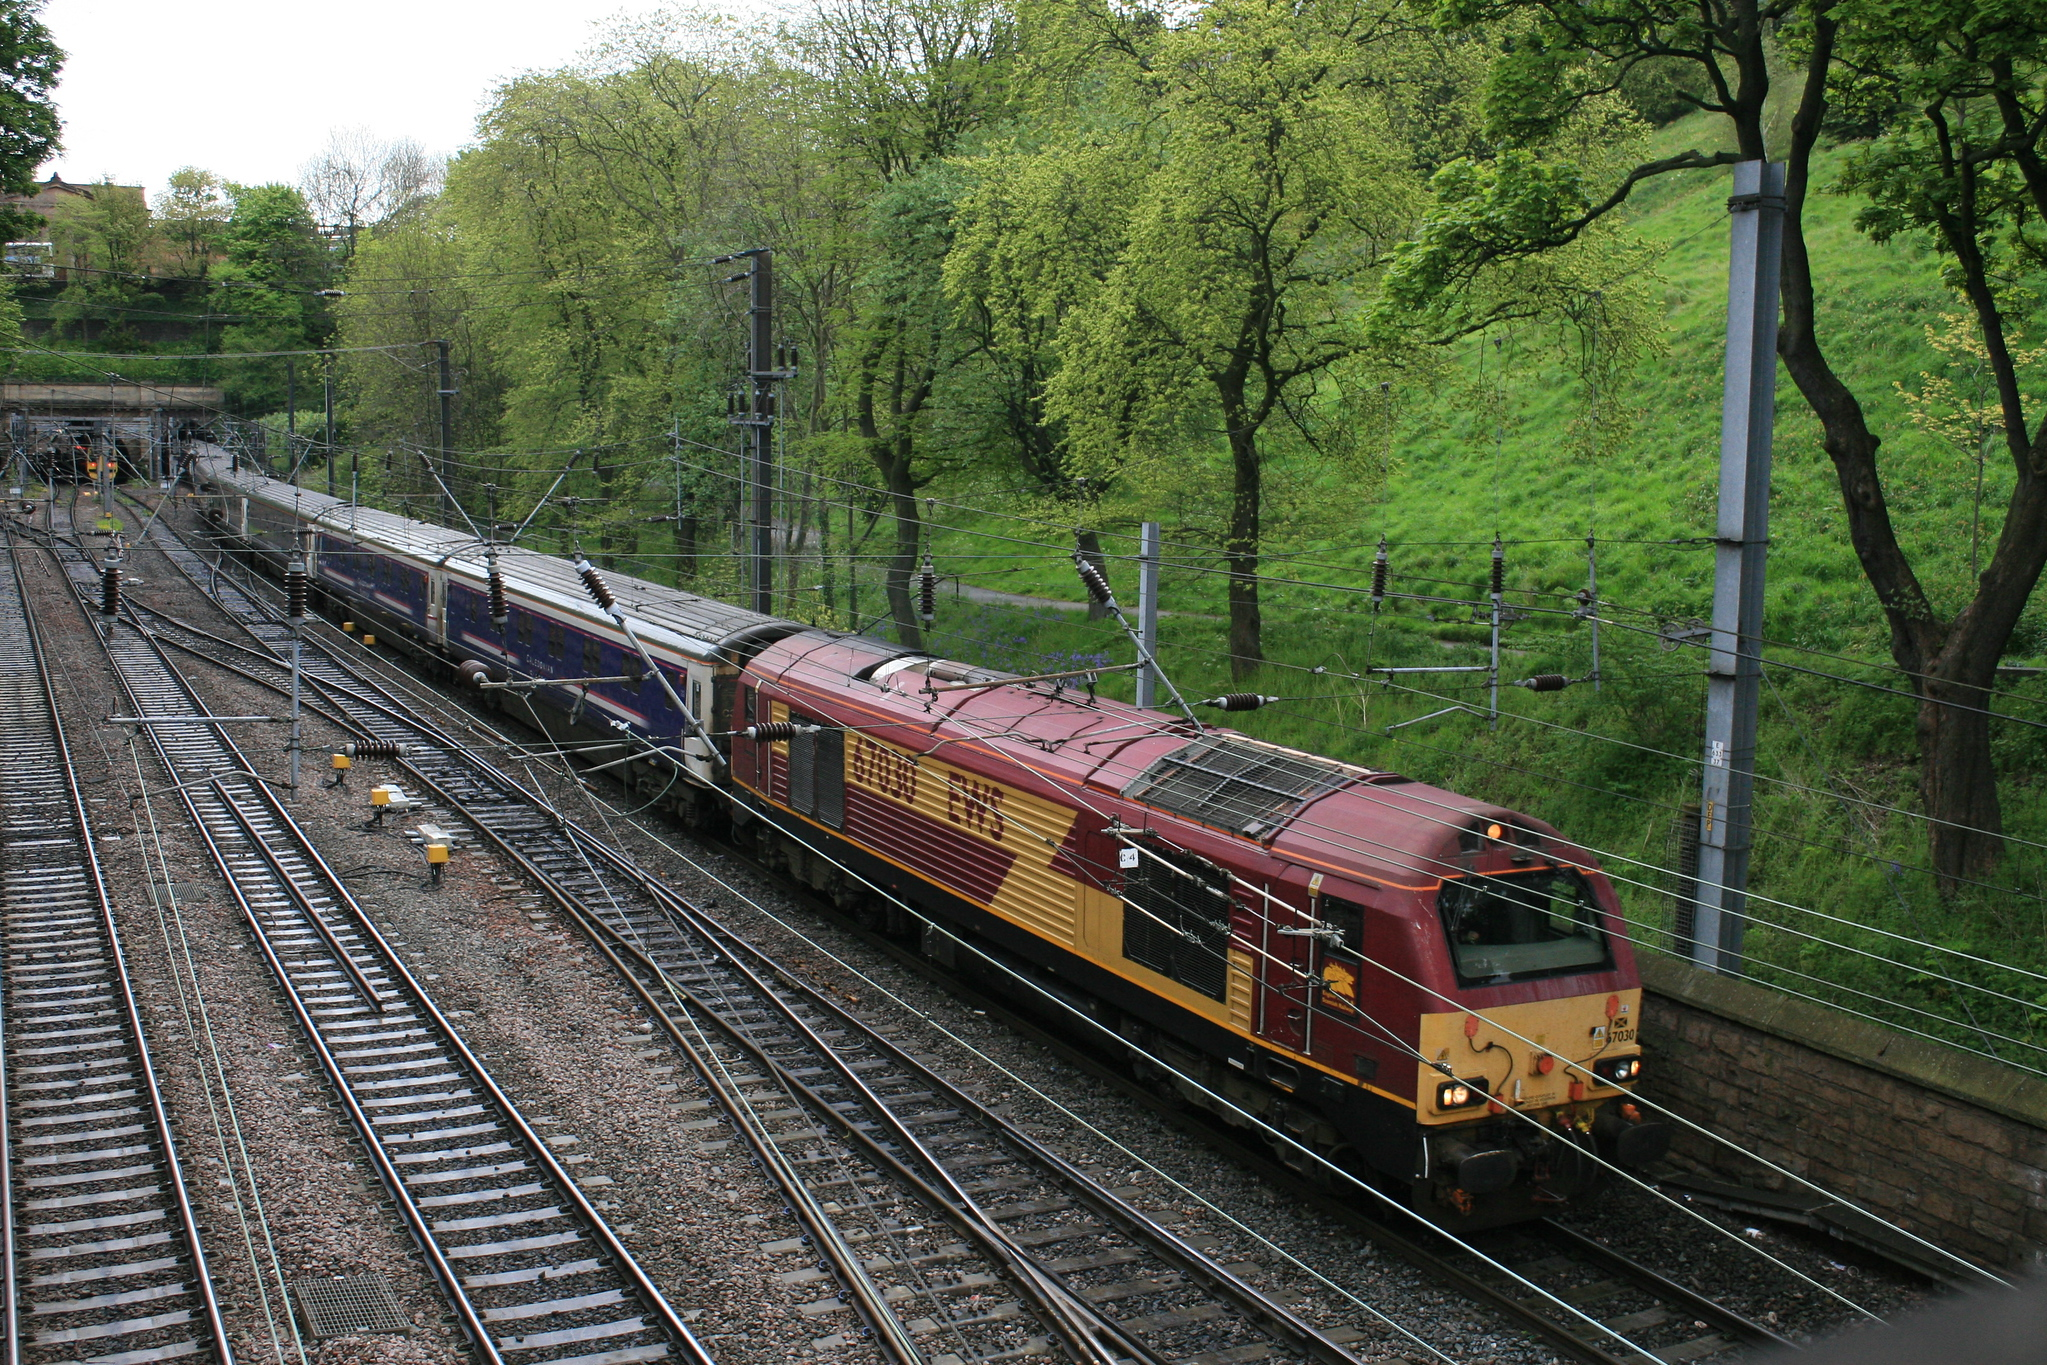 67030_DBS_CaledonianSleeper_EdinburghPrincesStGardens_18052016 (68)